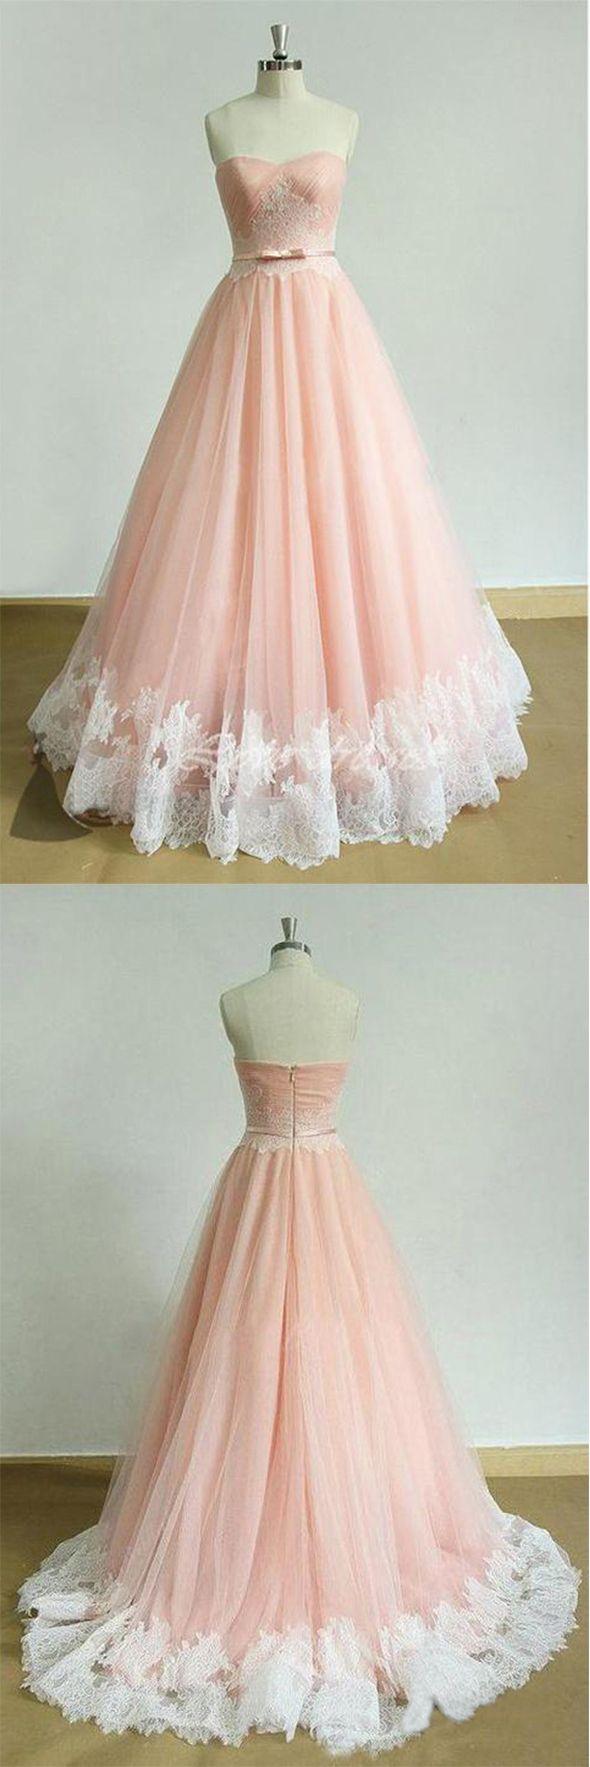 elegant prom dresses,long prom dress,sweetheart prom dresses,applique prom gown,a-line prom dresses,pink evening dress #pink #sweetheart #aline #long #prom #elegant #okdresses